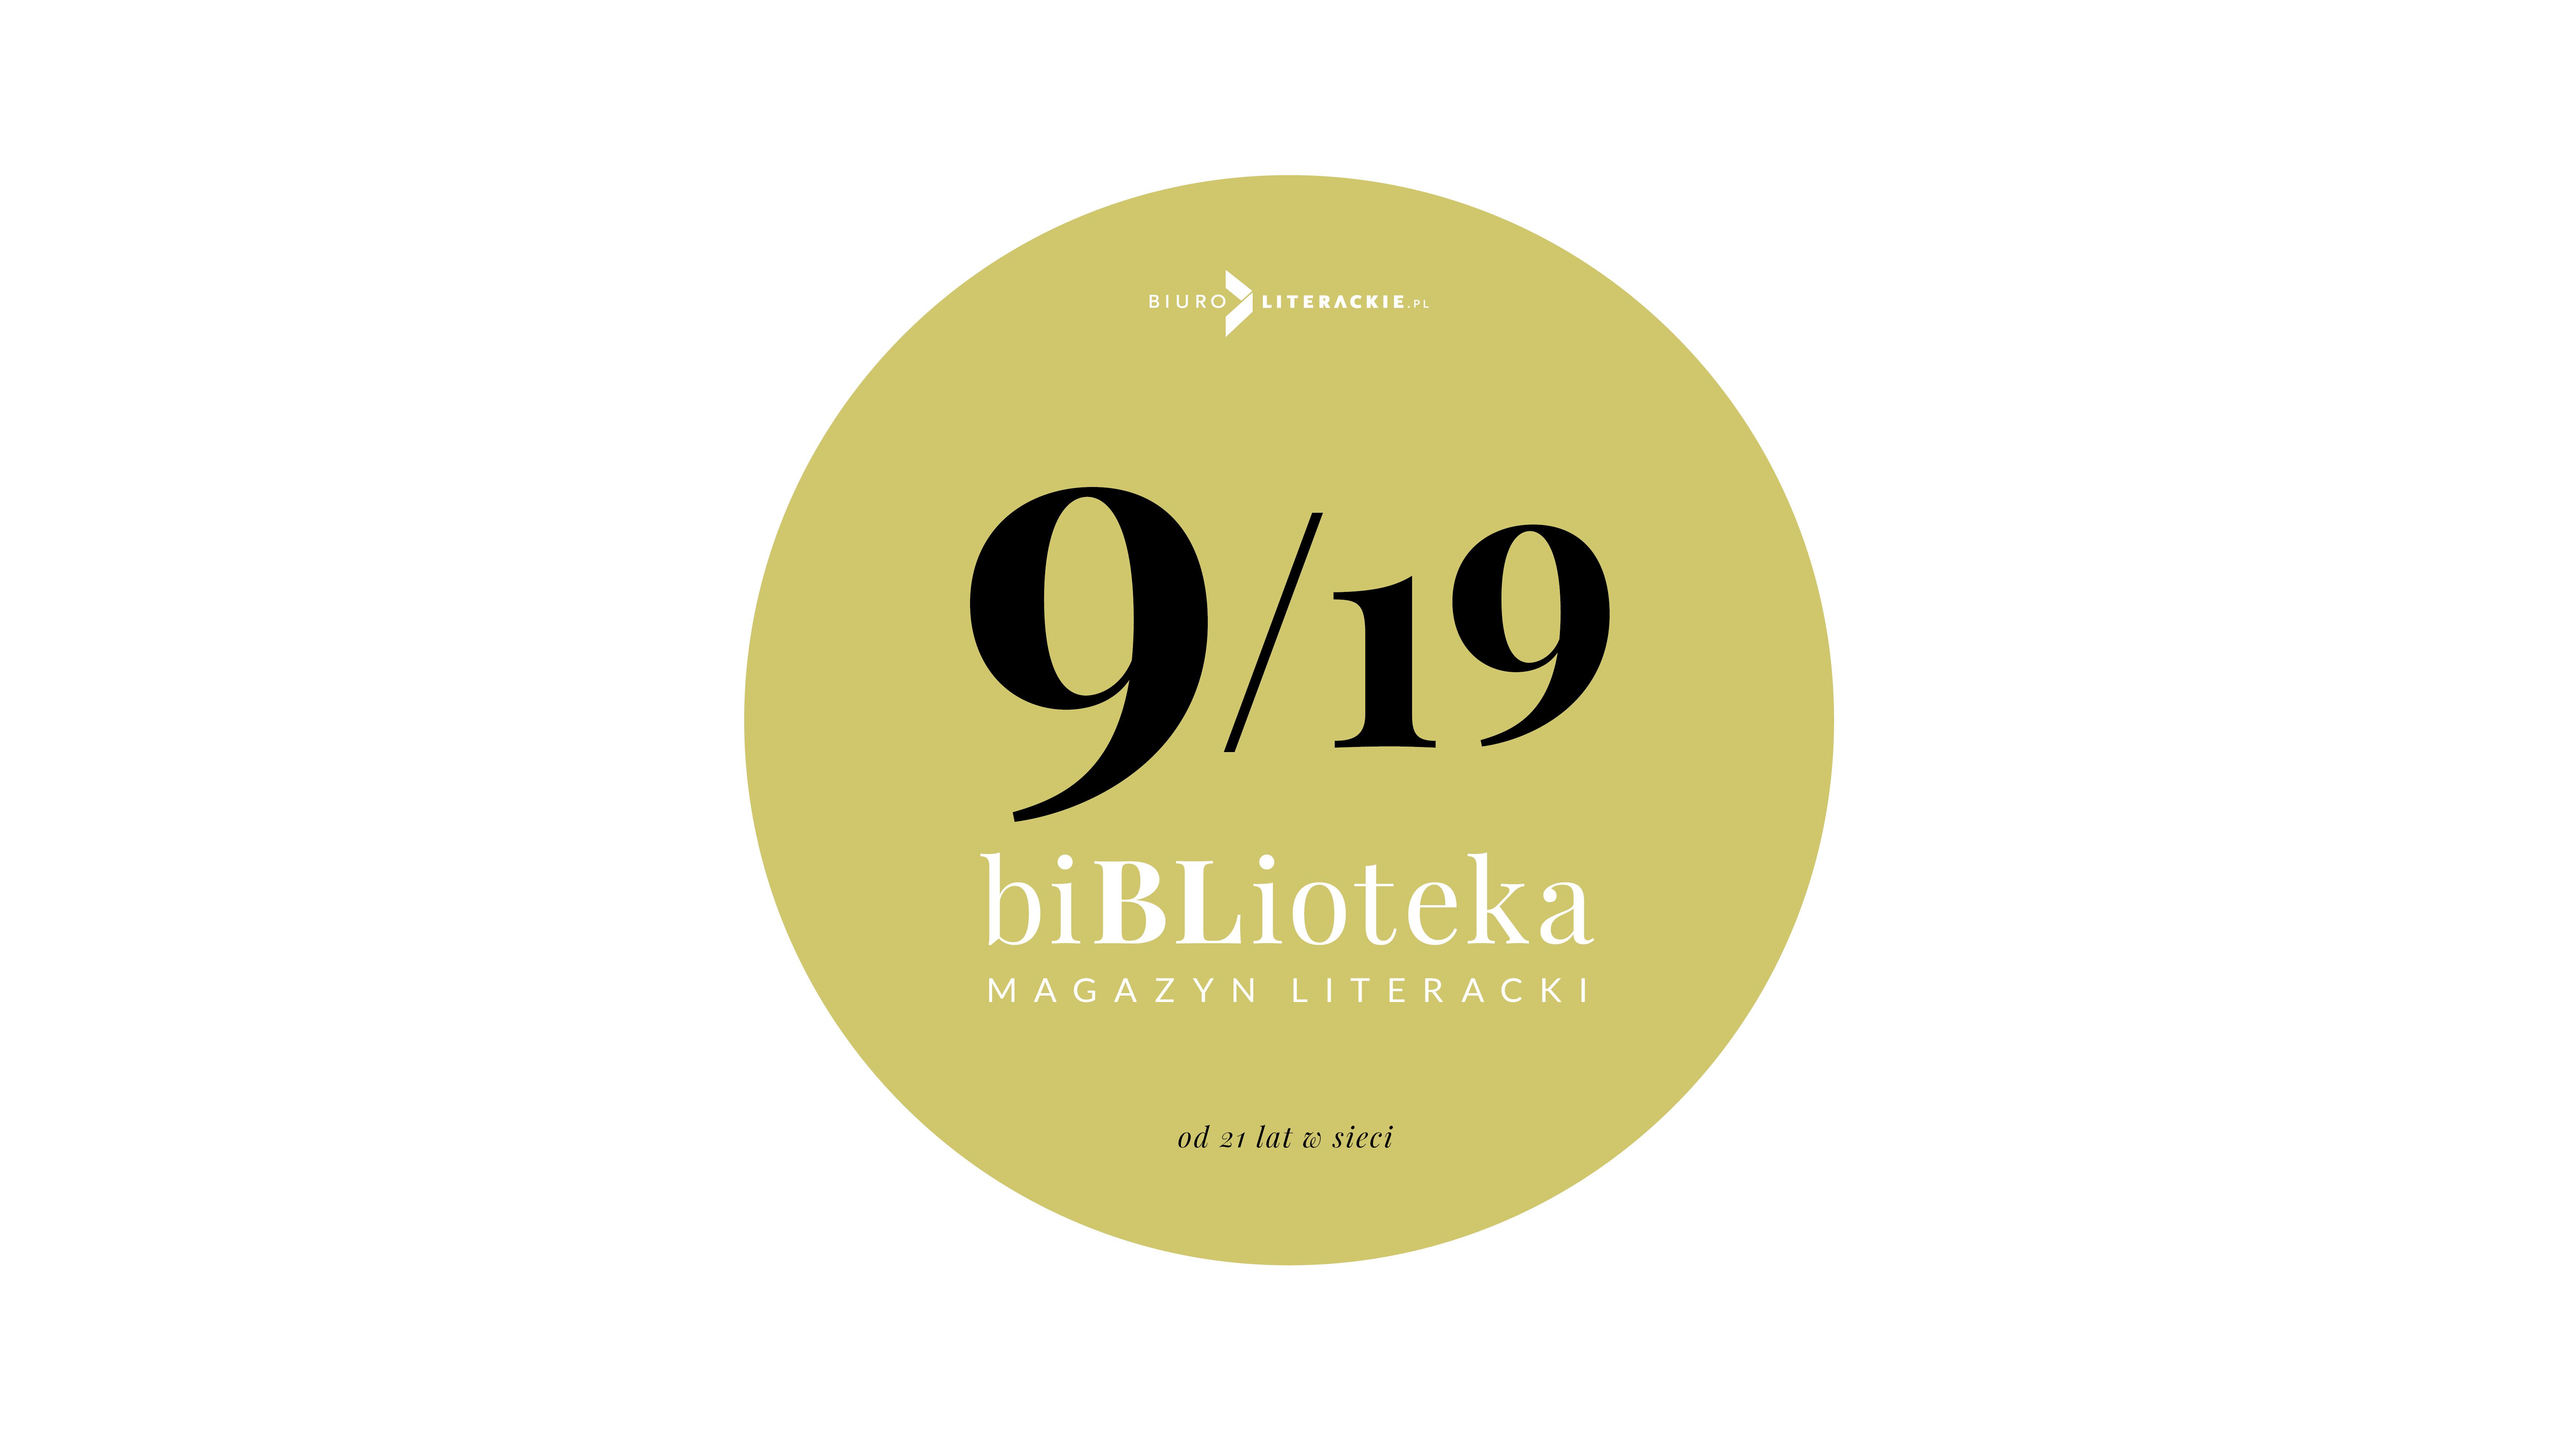 BL Info 2019.06.26 biBLioteka nr 9 2019__www_top